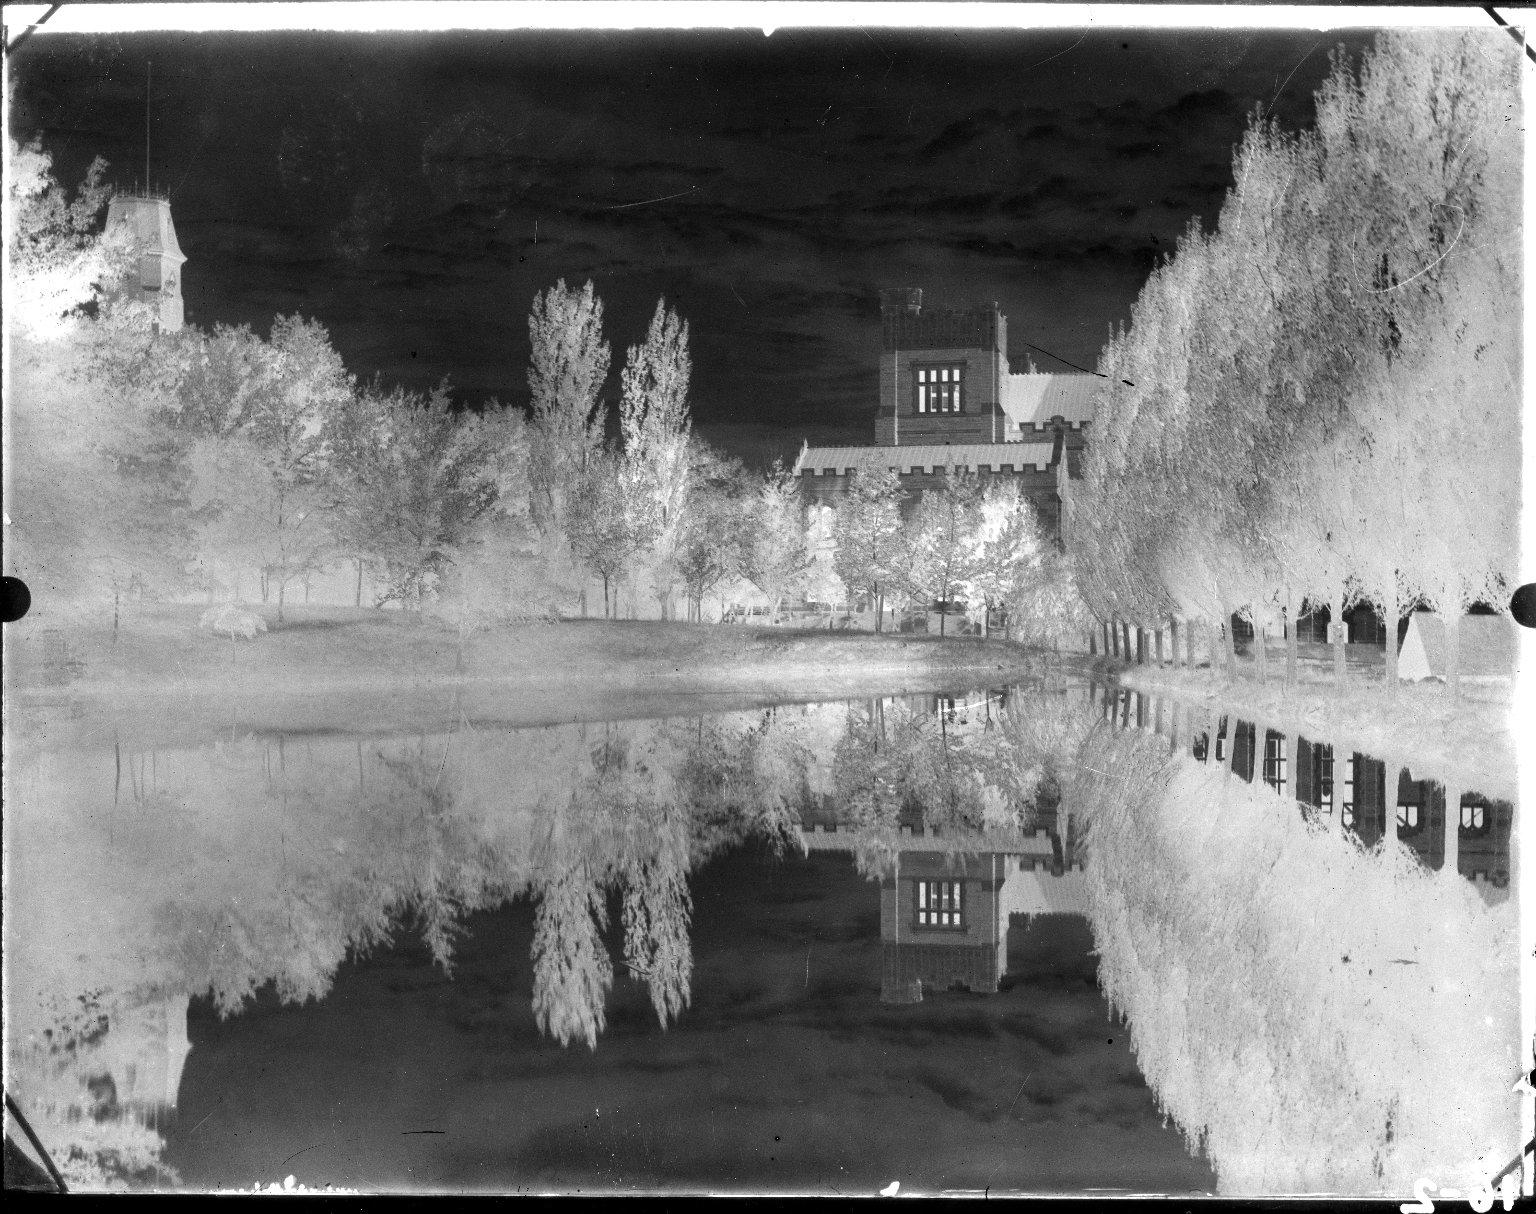 Macky Auditorium & Varsity Lake Dam